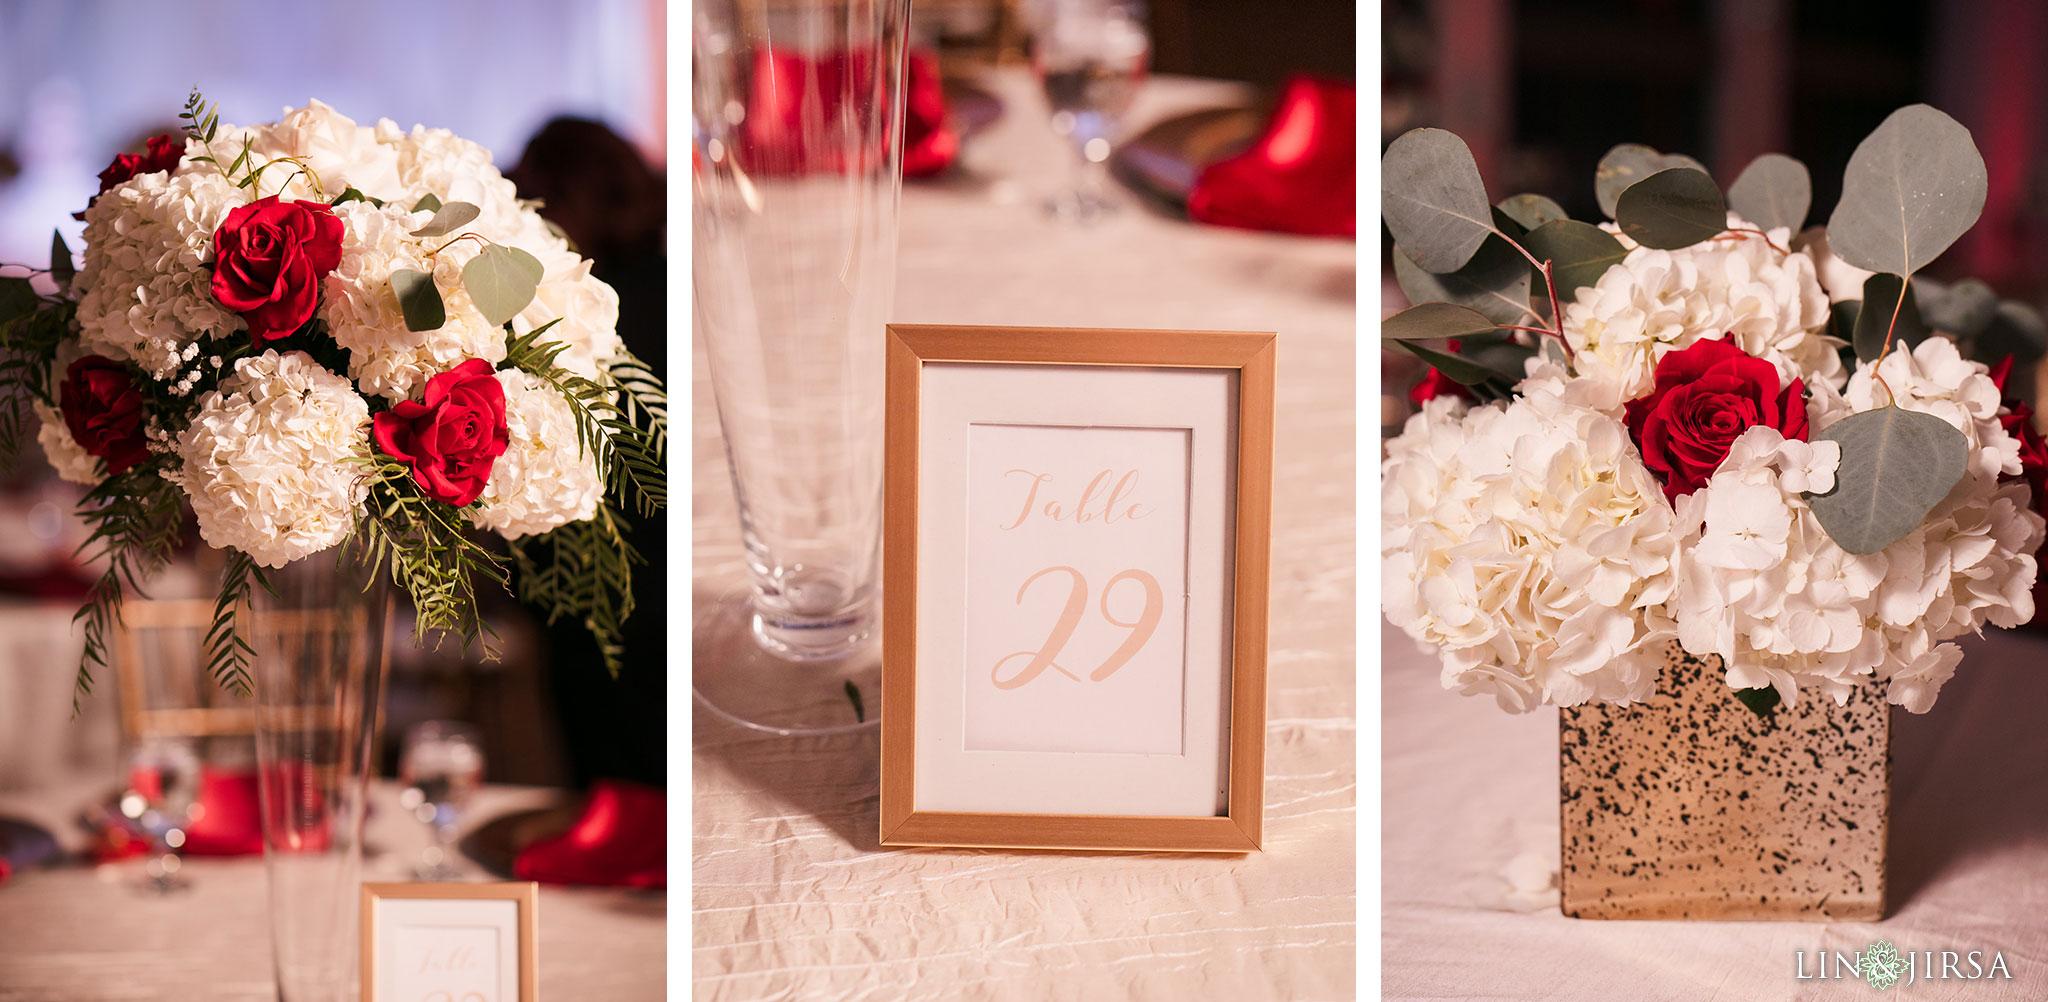 25 Diamond Bar Center Inland Empire Indian Wedding Photography